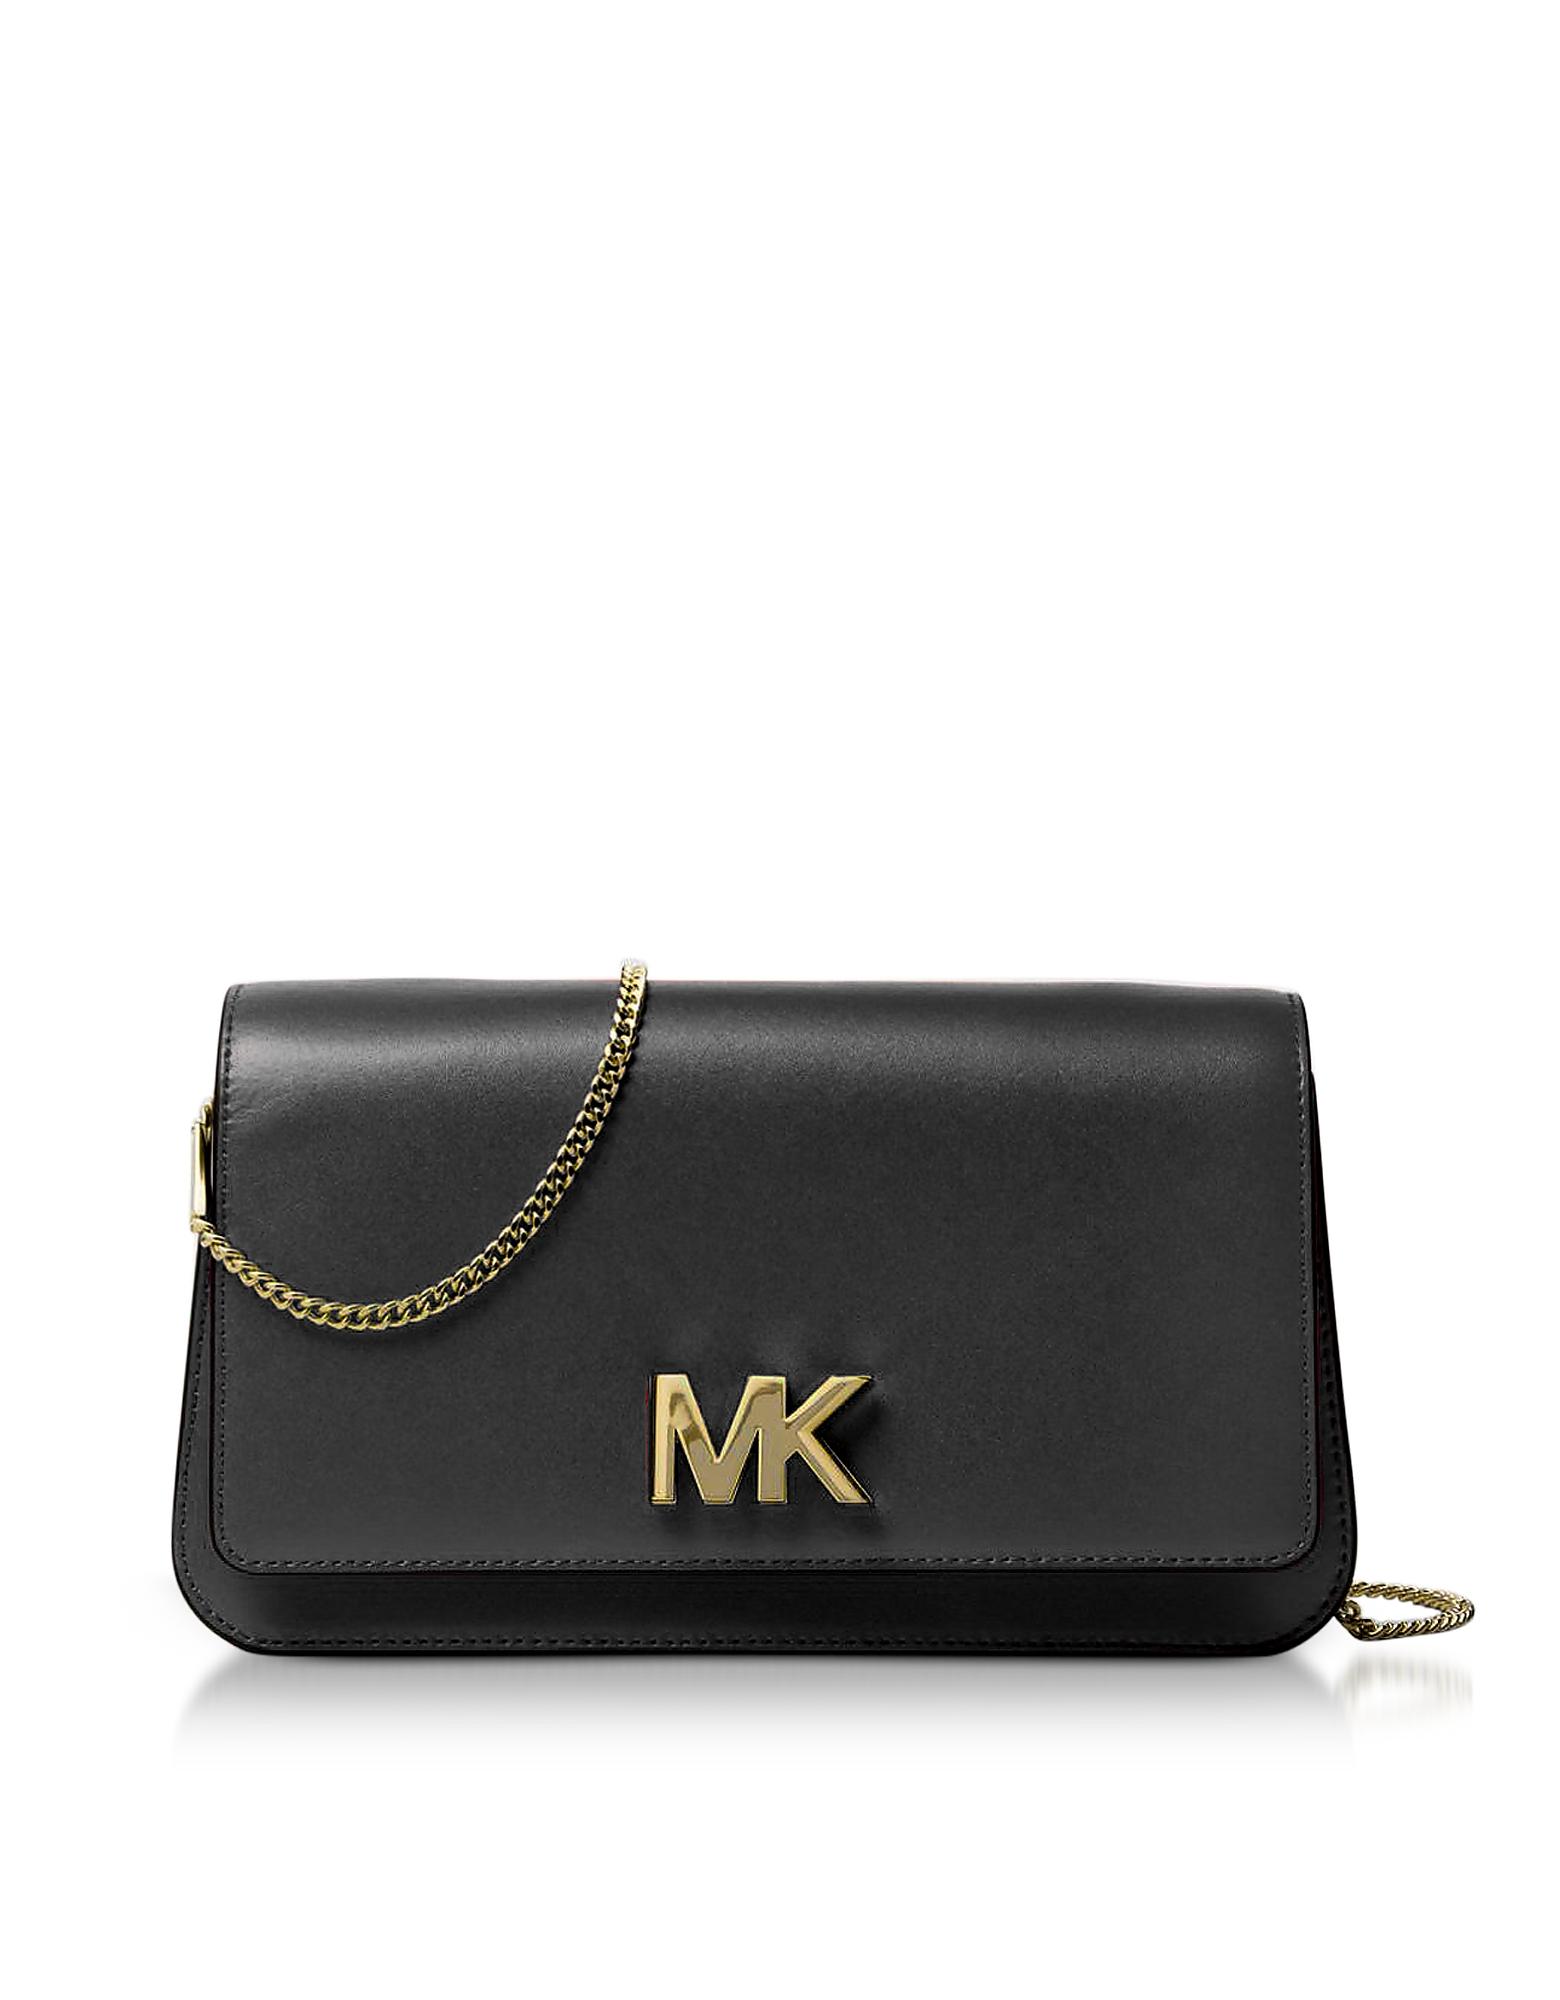 Michael Kors Handbags, Mott Large Black Leather Clutch